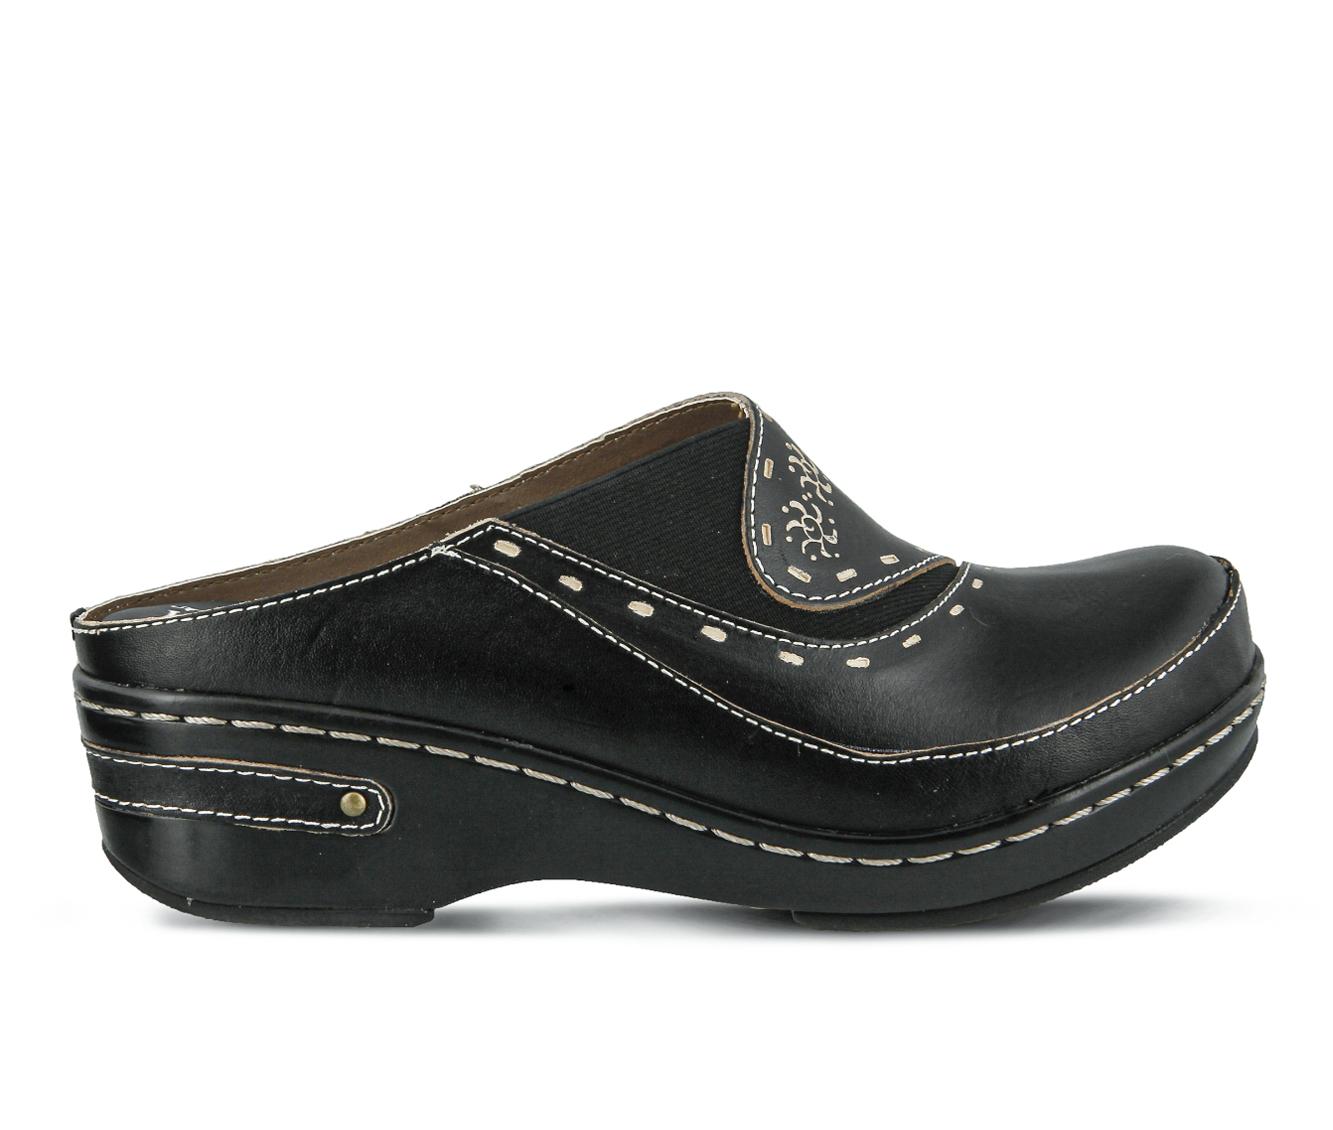 L'Artiste Chino Women's Shoe (Black Leather)